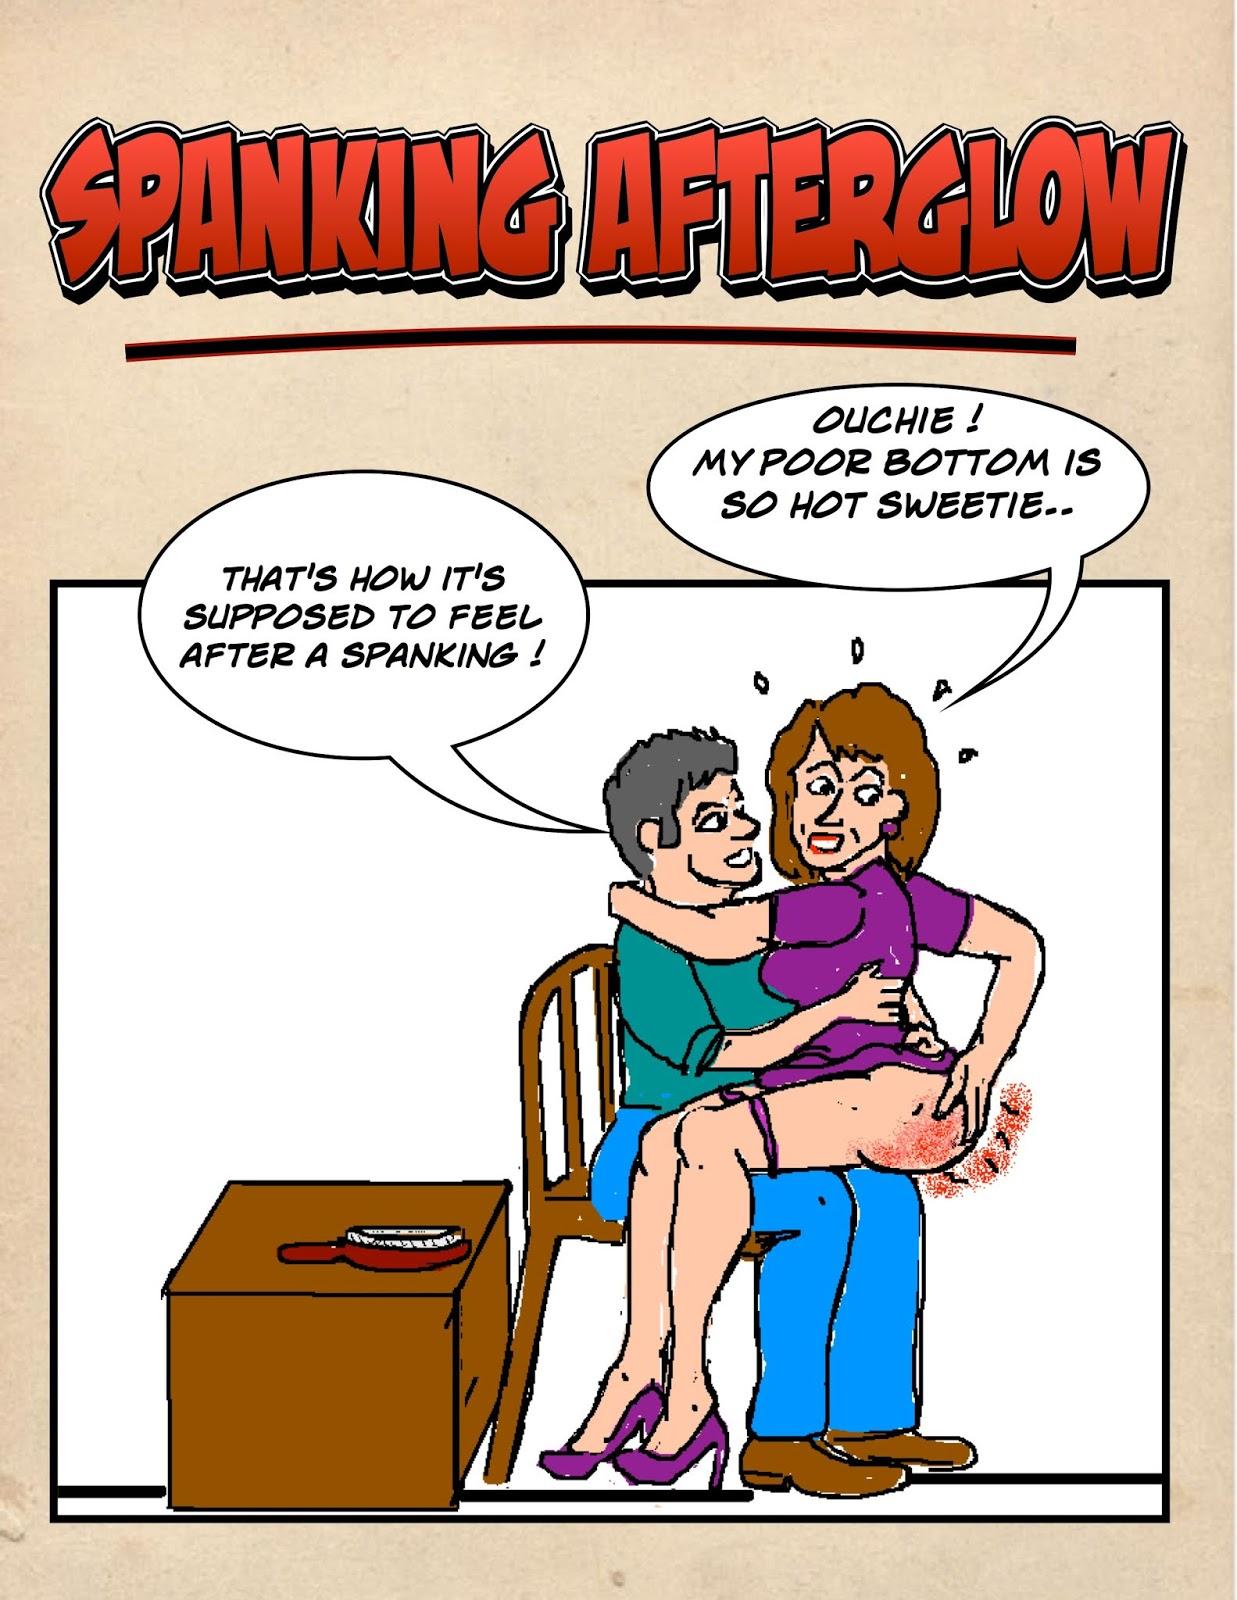 porn star reed